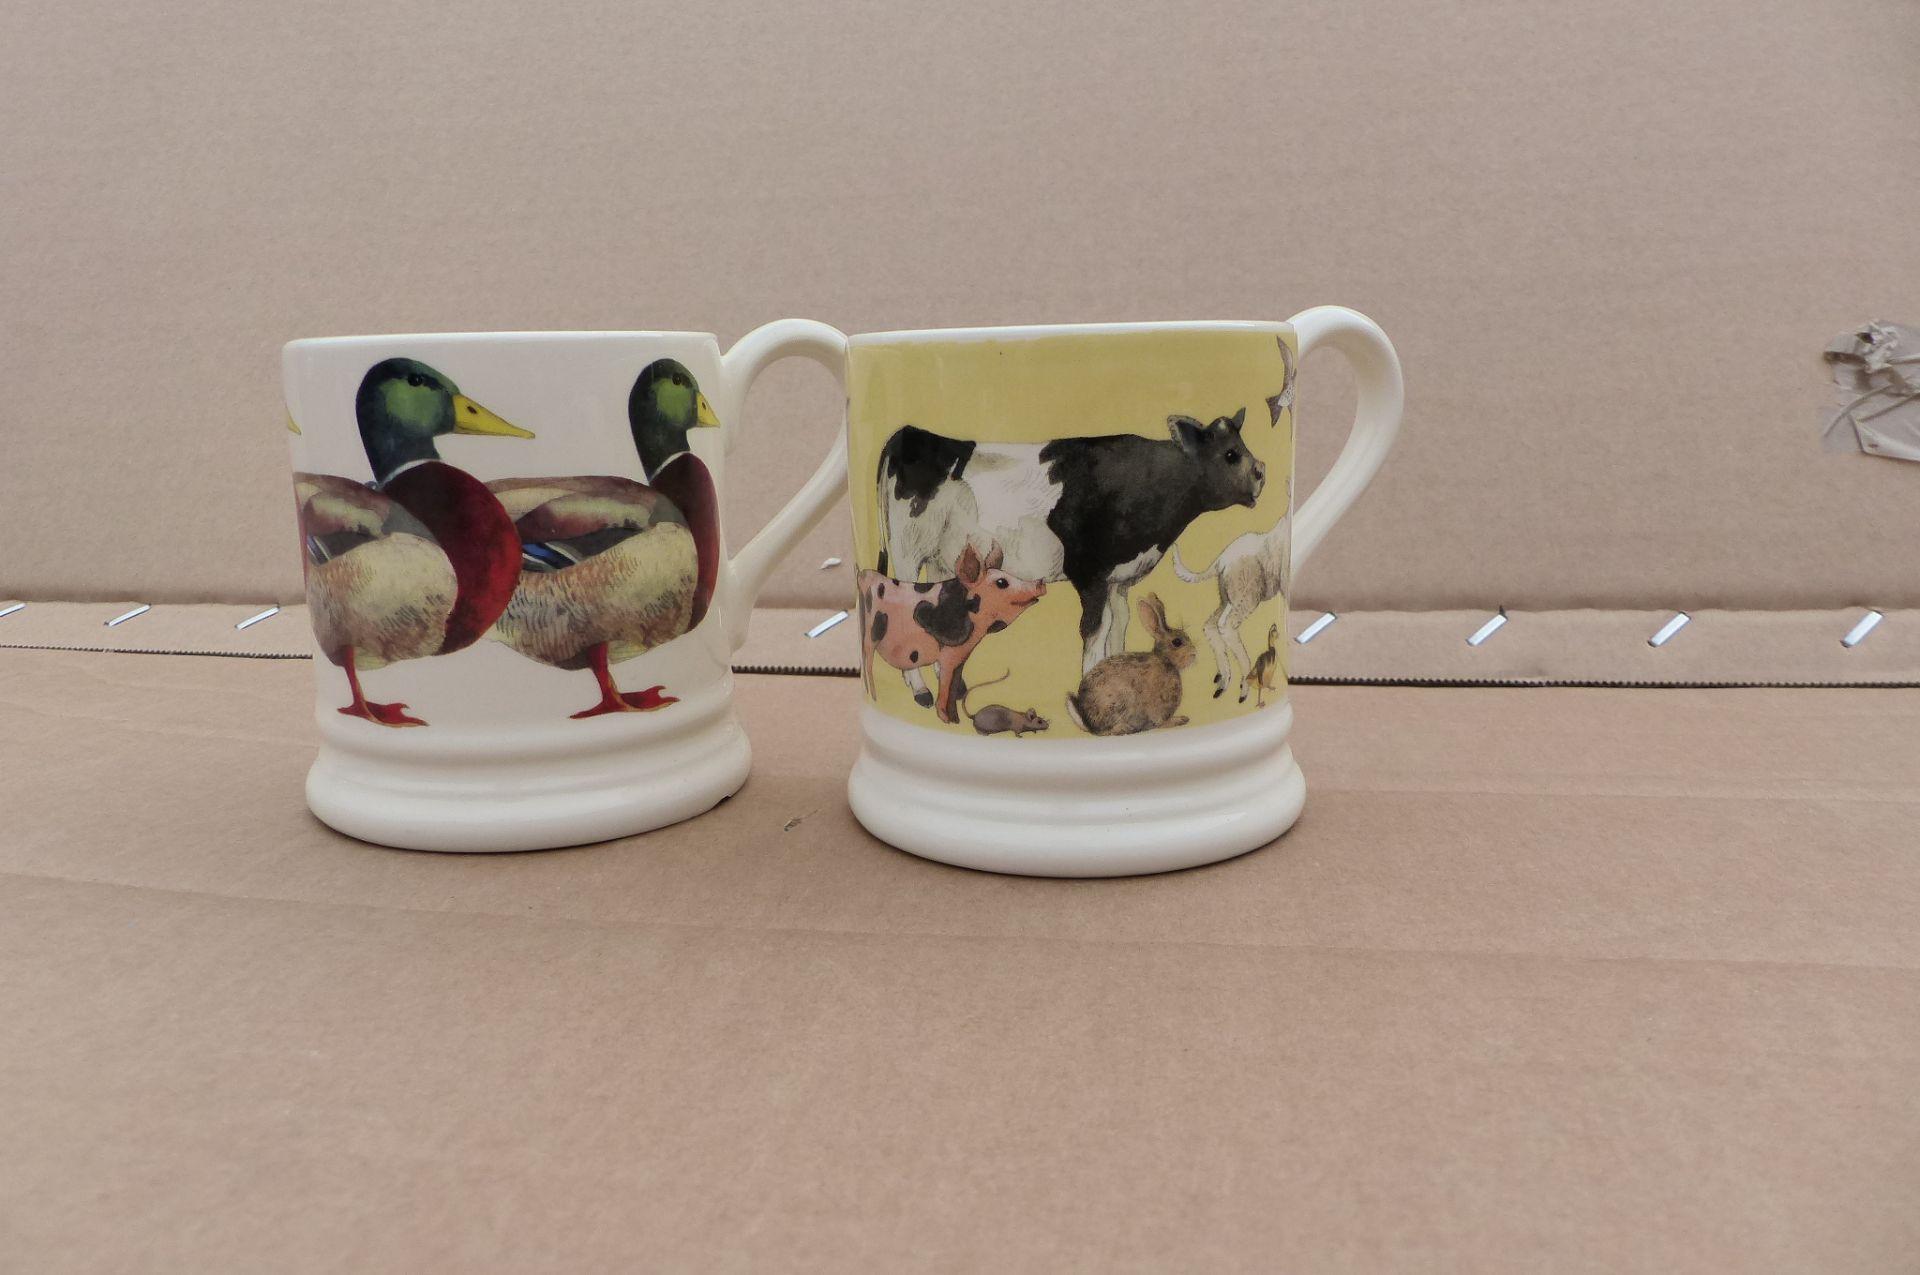 2 Emma Bridgewater Mugs